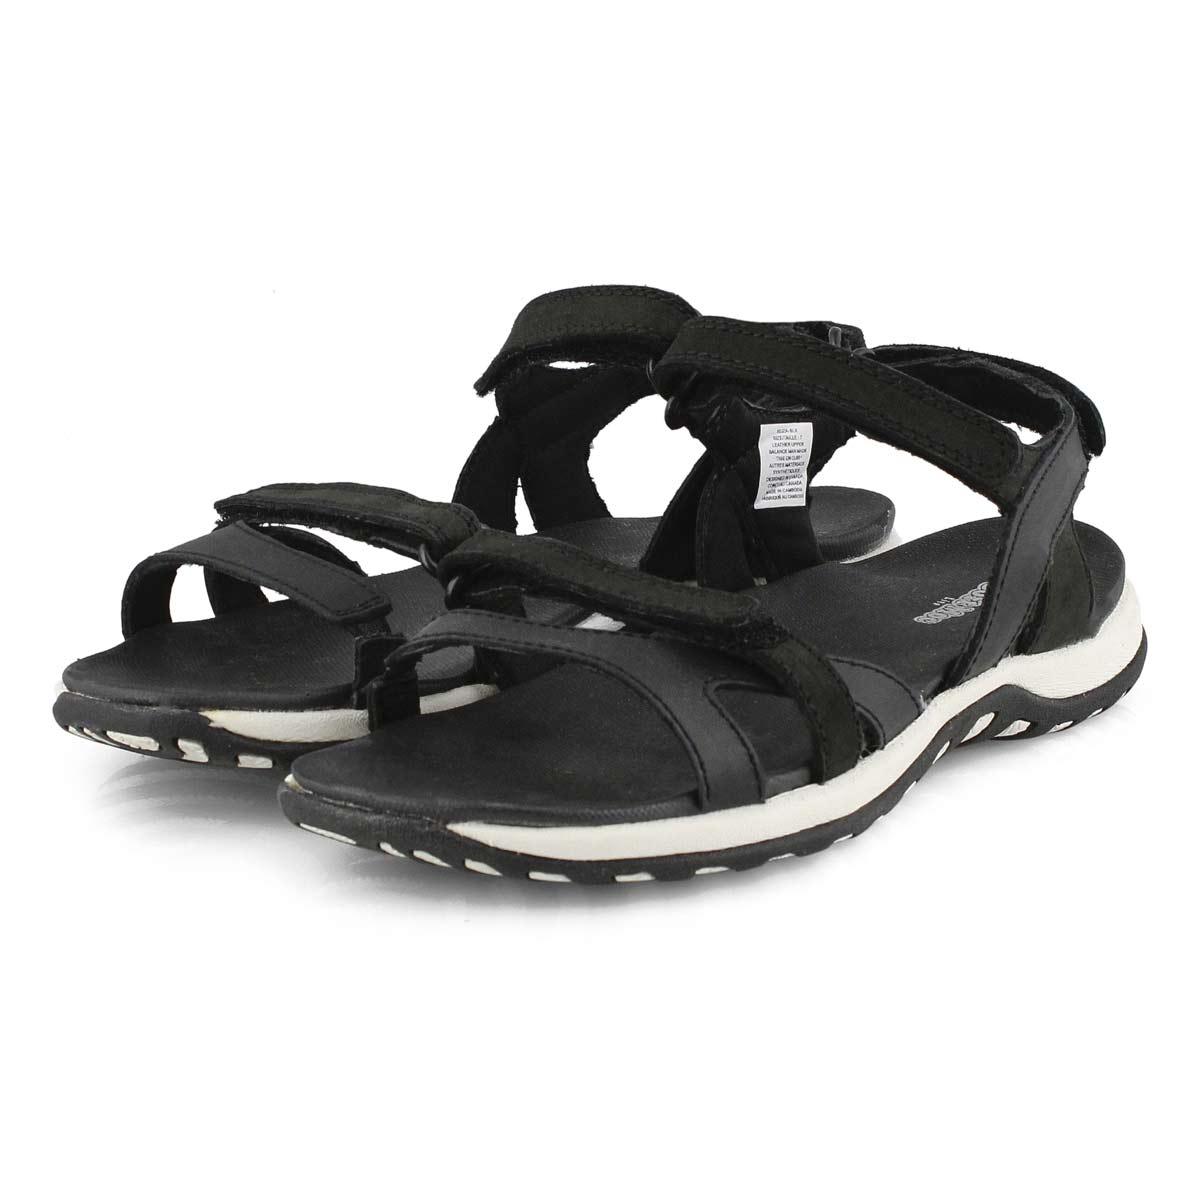 Lds Eliza black sport sandal